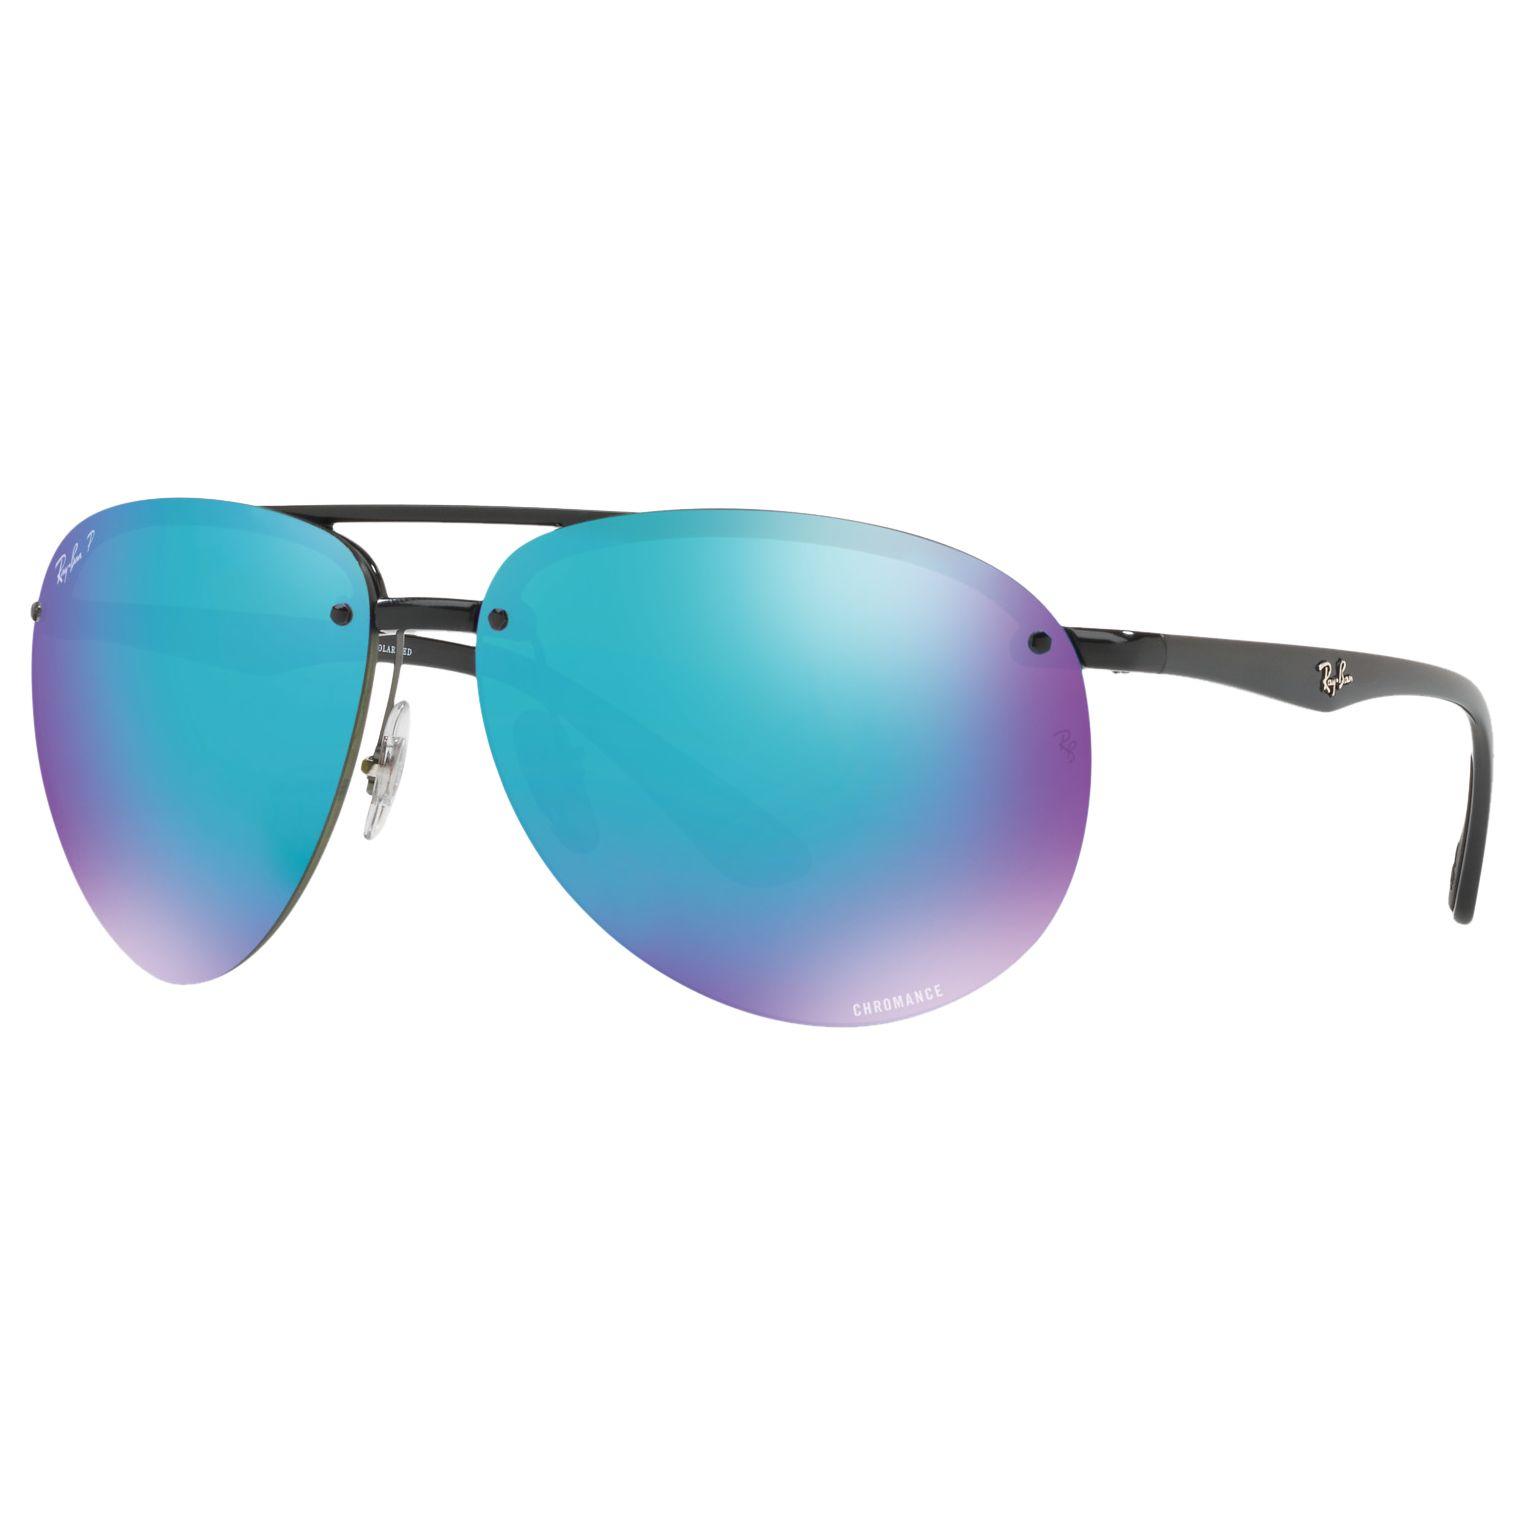 47d89e9d6 Ray-Ban RB4293CH Chromance Polarised Aviator Sunglasses at John Lewis &  Partners